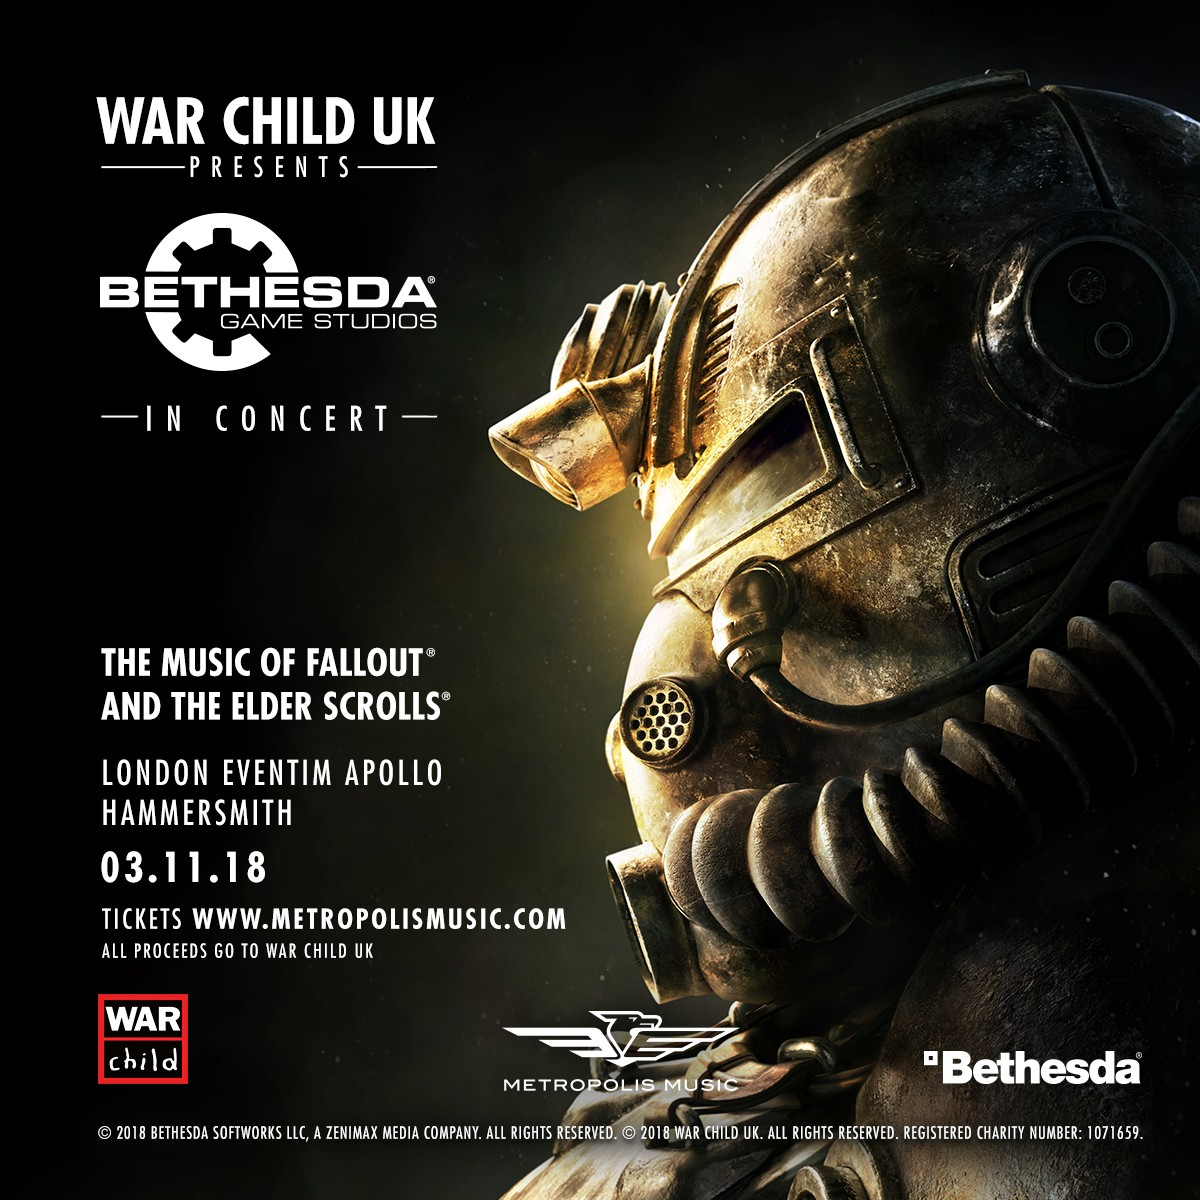 bethesda in concert poster